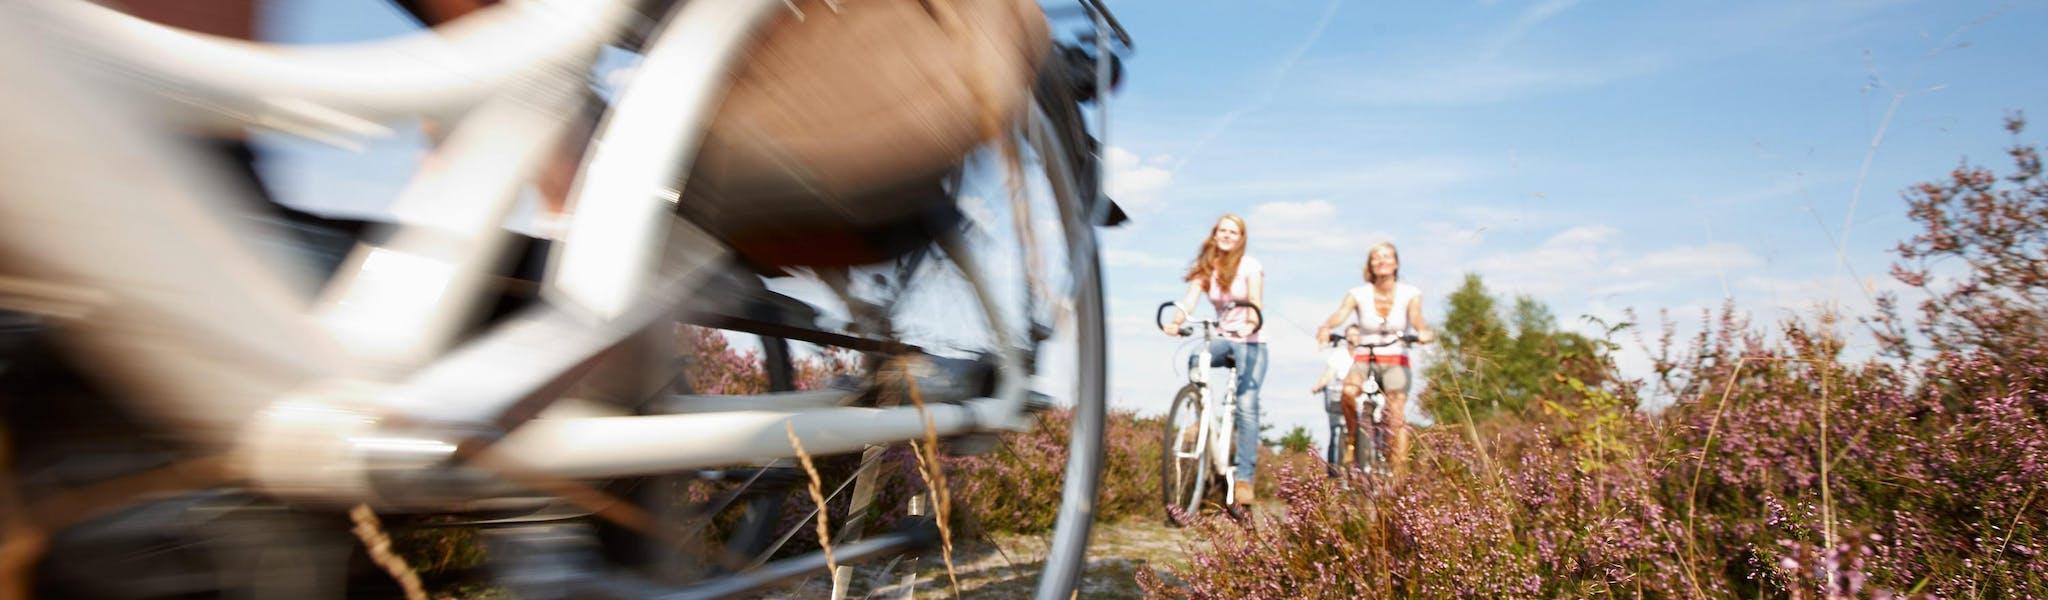 6-daagse fietsvakantie Lüneburger Heide